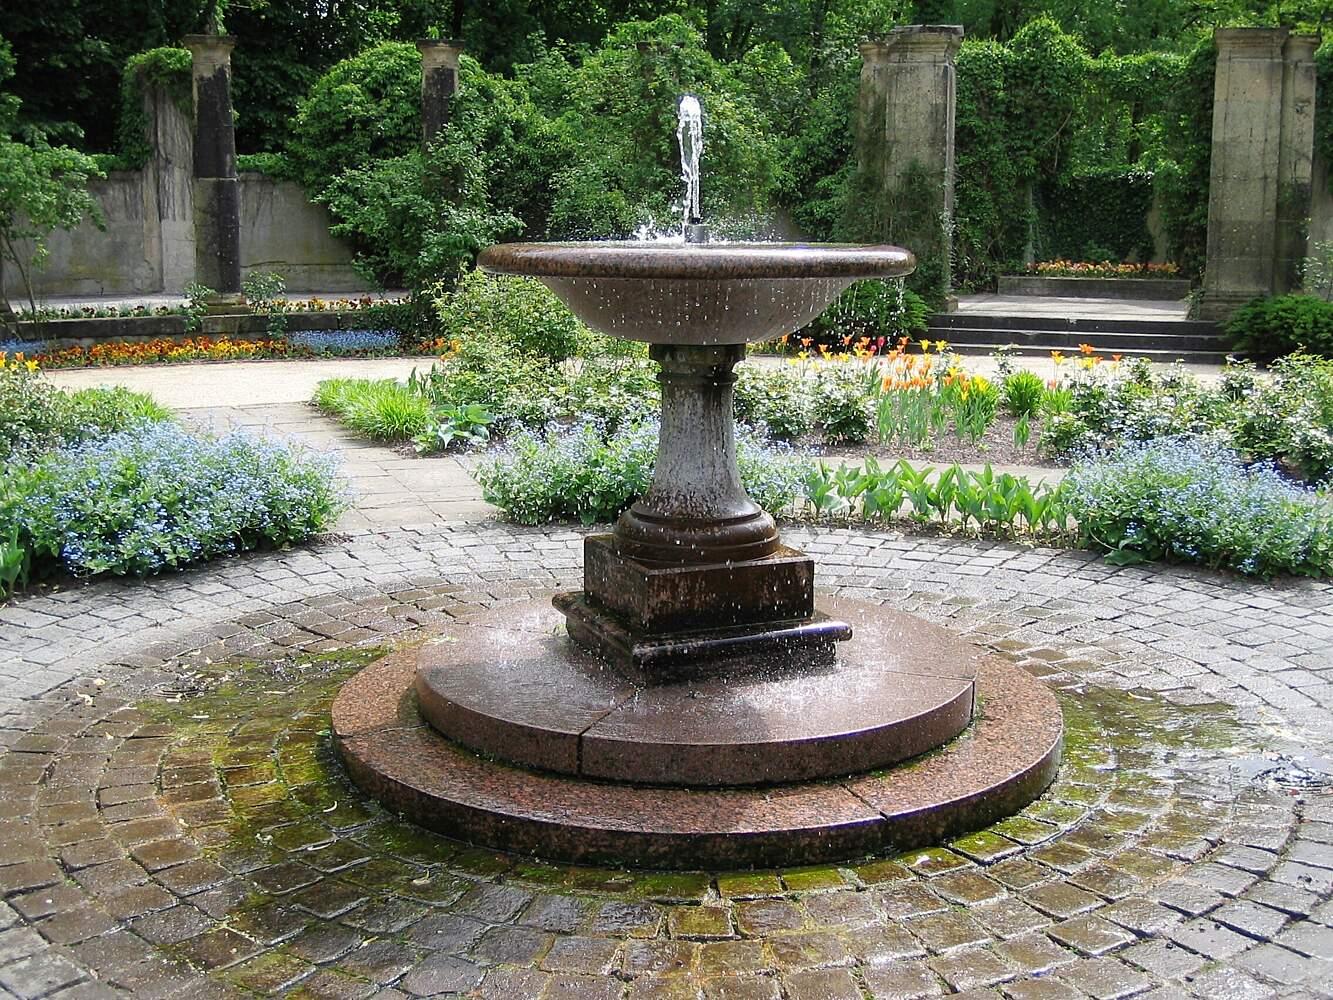 Englischer Garten Berlin Neu Tiergarten Park – Berlin – tourist attractions Tropter